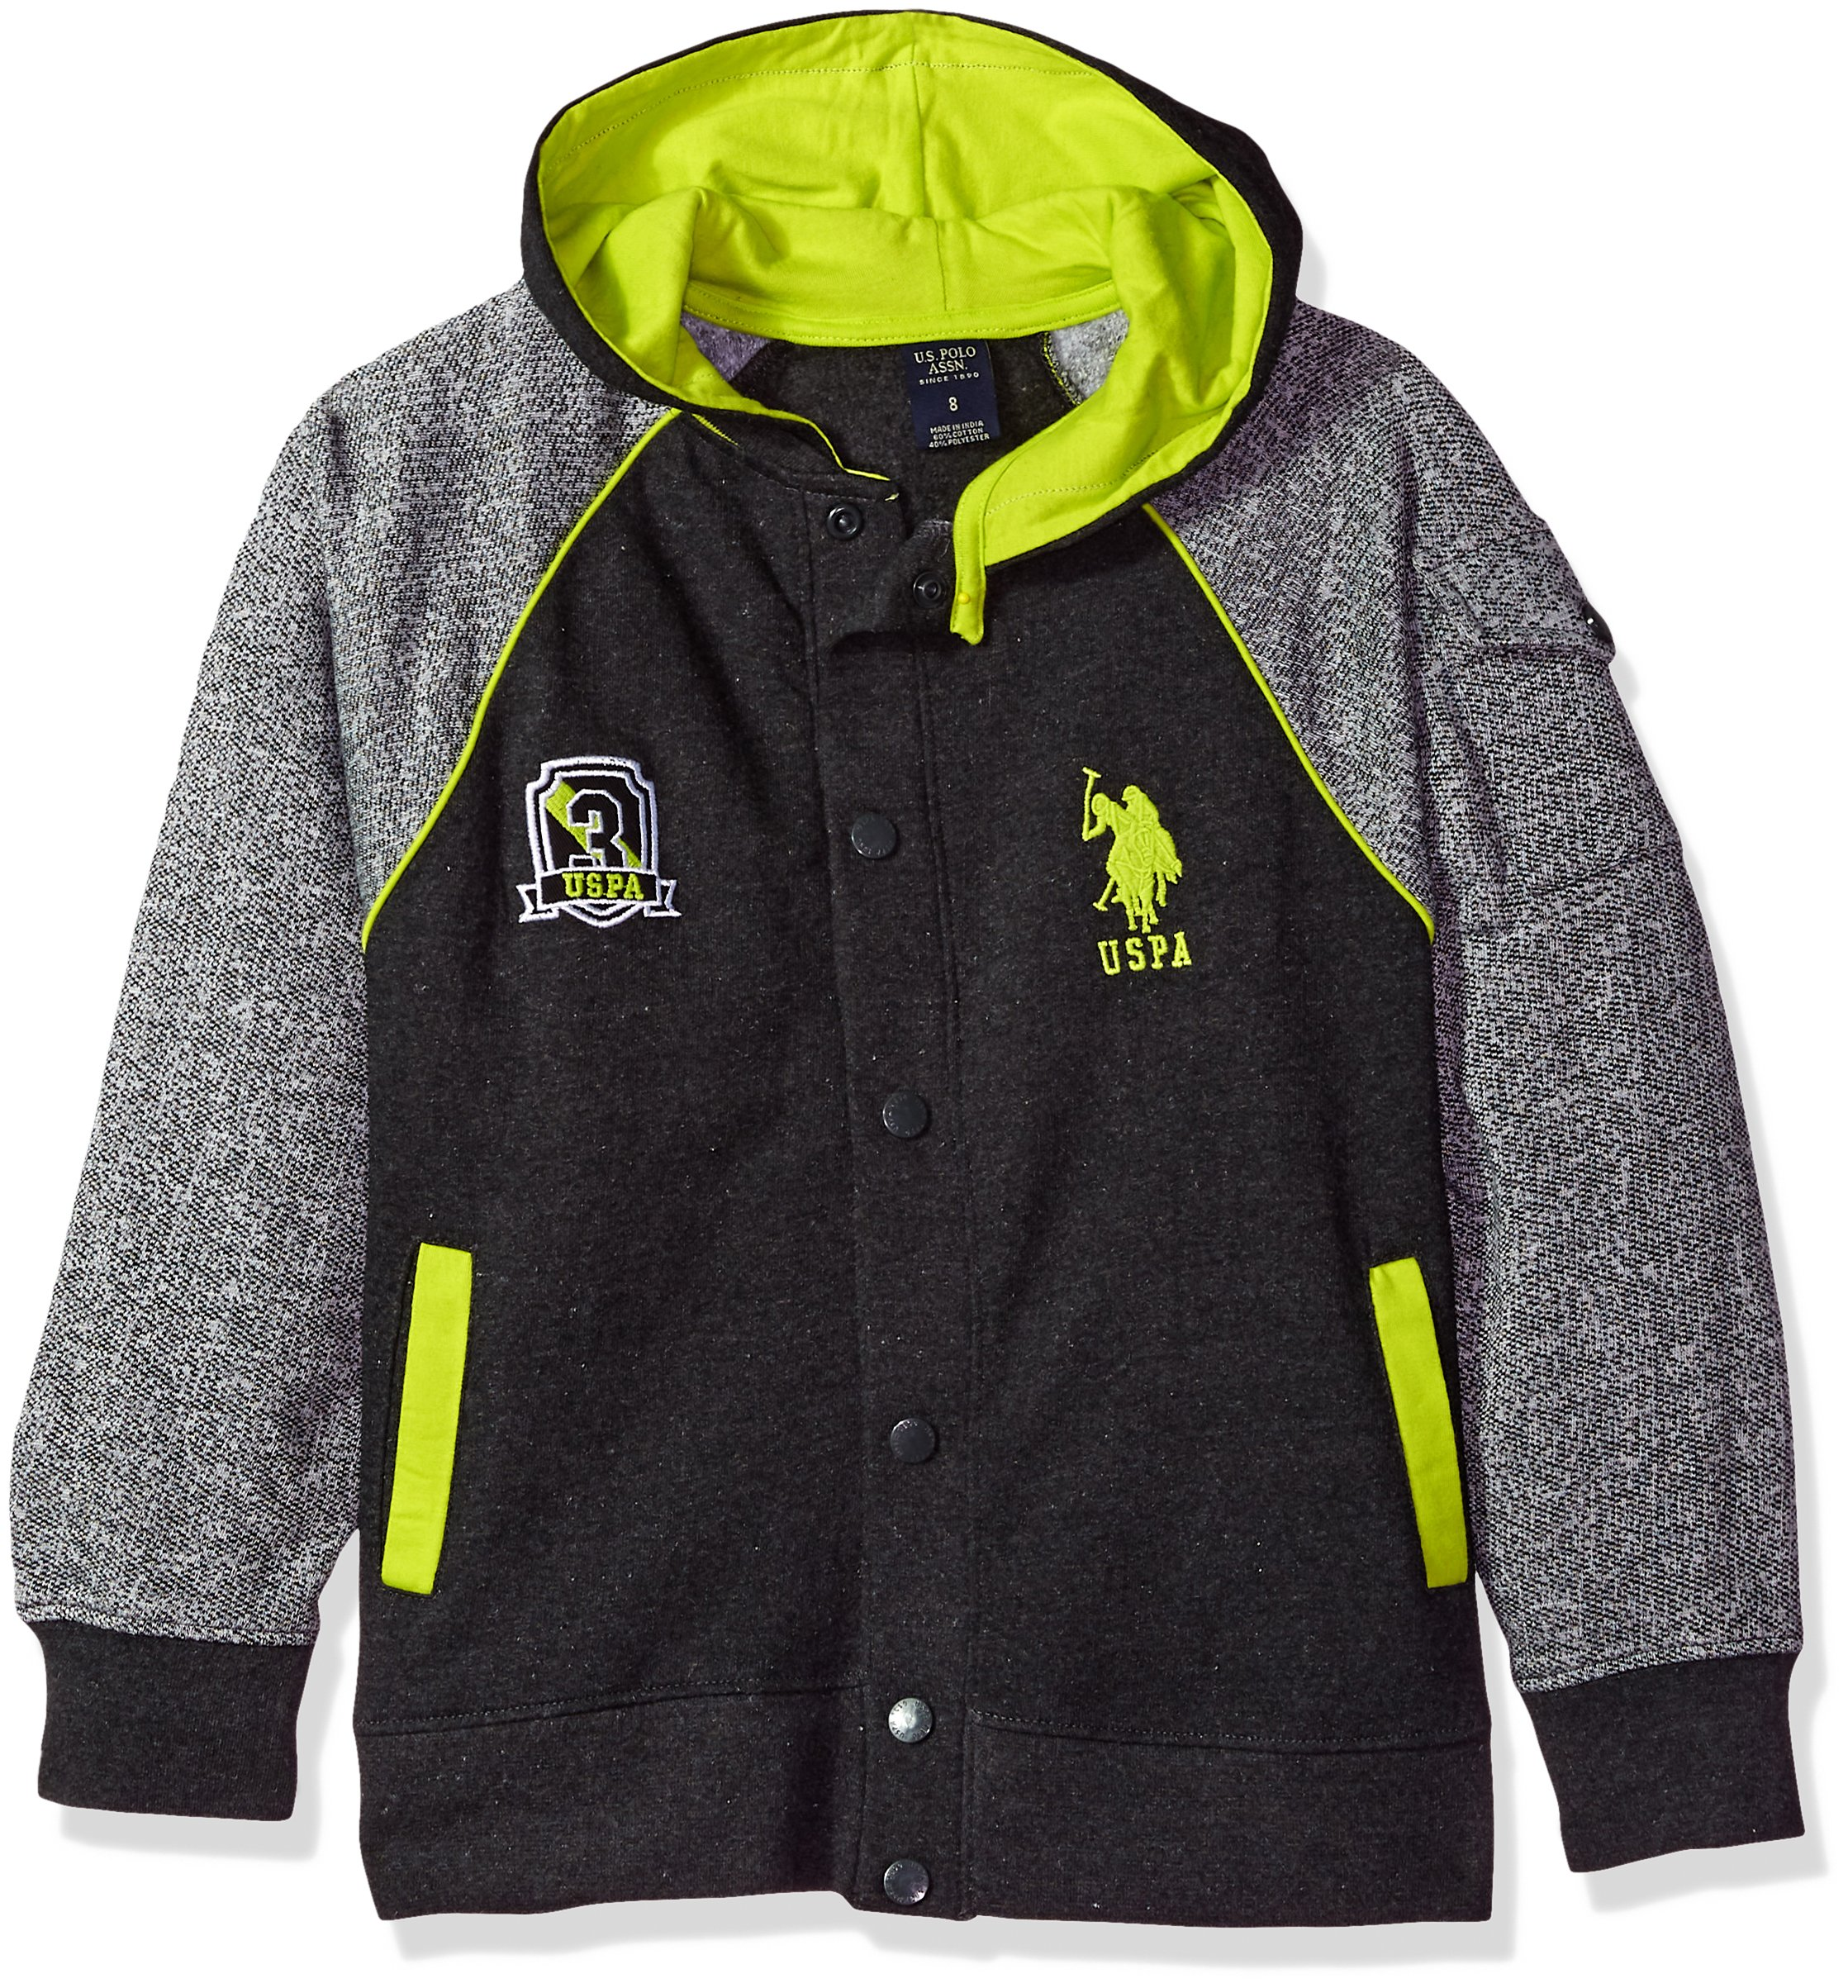 U.S. Polo Assn. Big Boys' Long Sleeve Button up Fleece Hoodie, Dark Heather Gray, 18